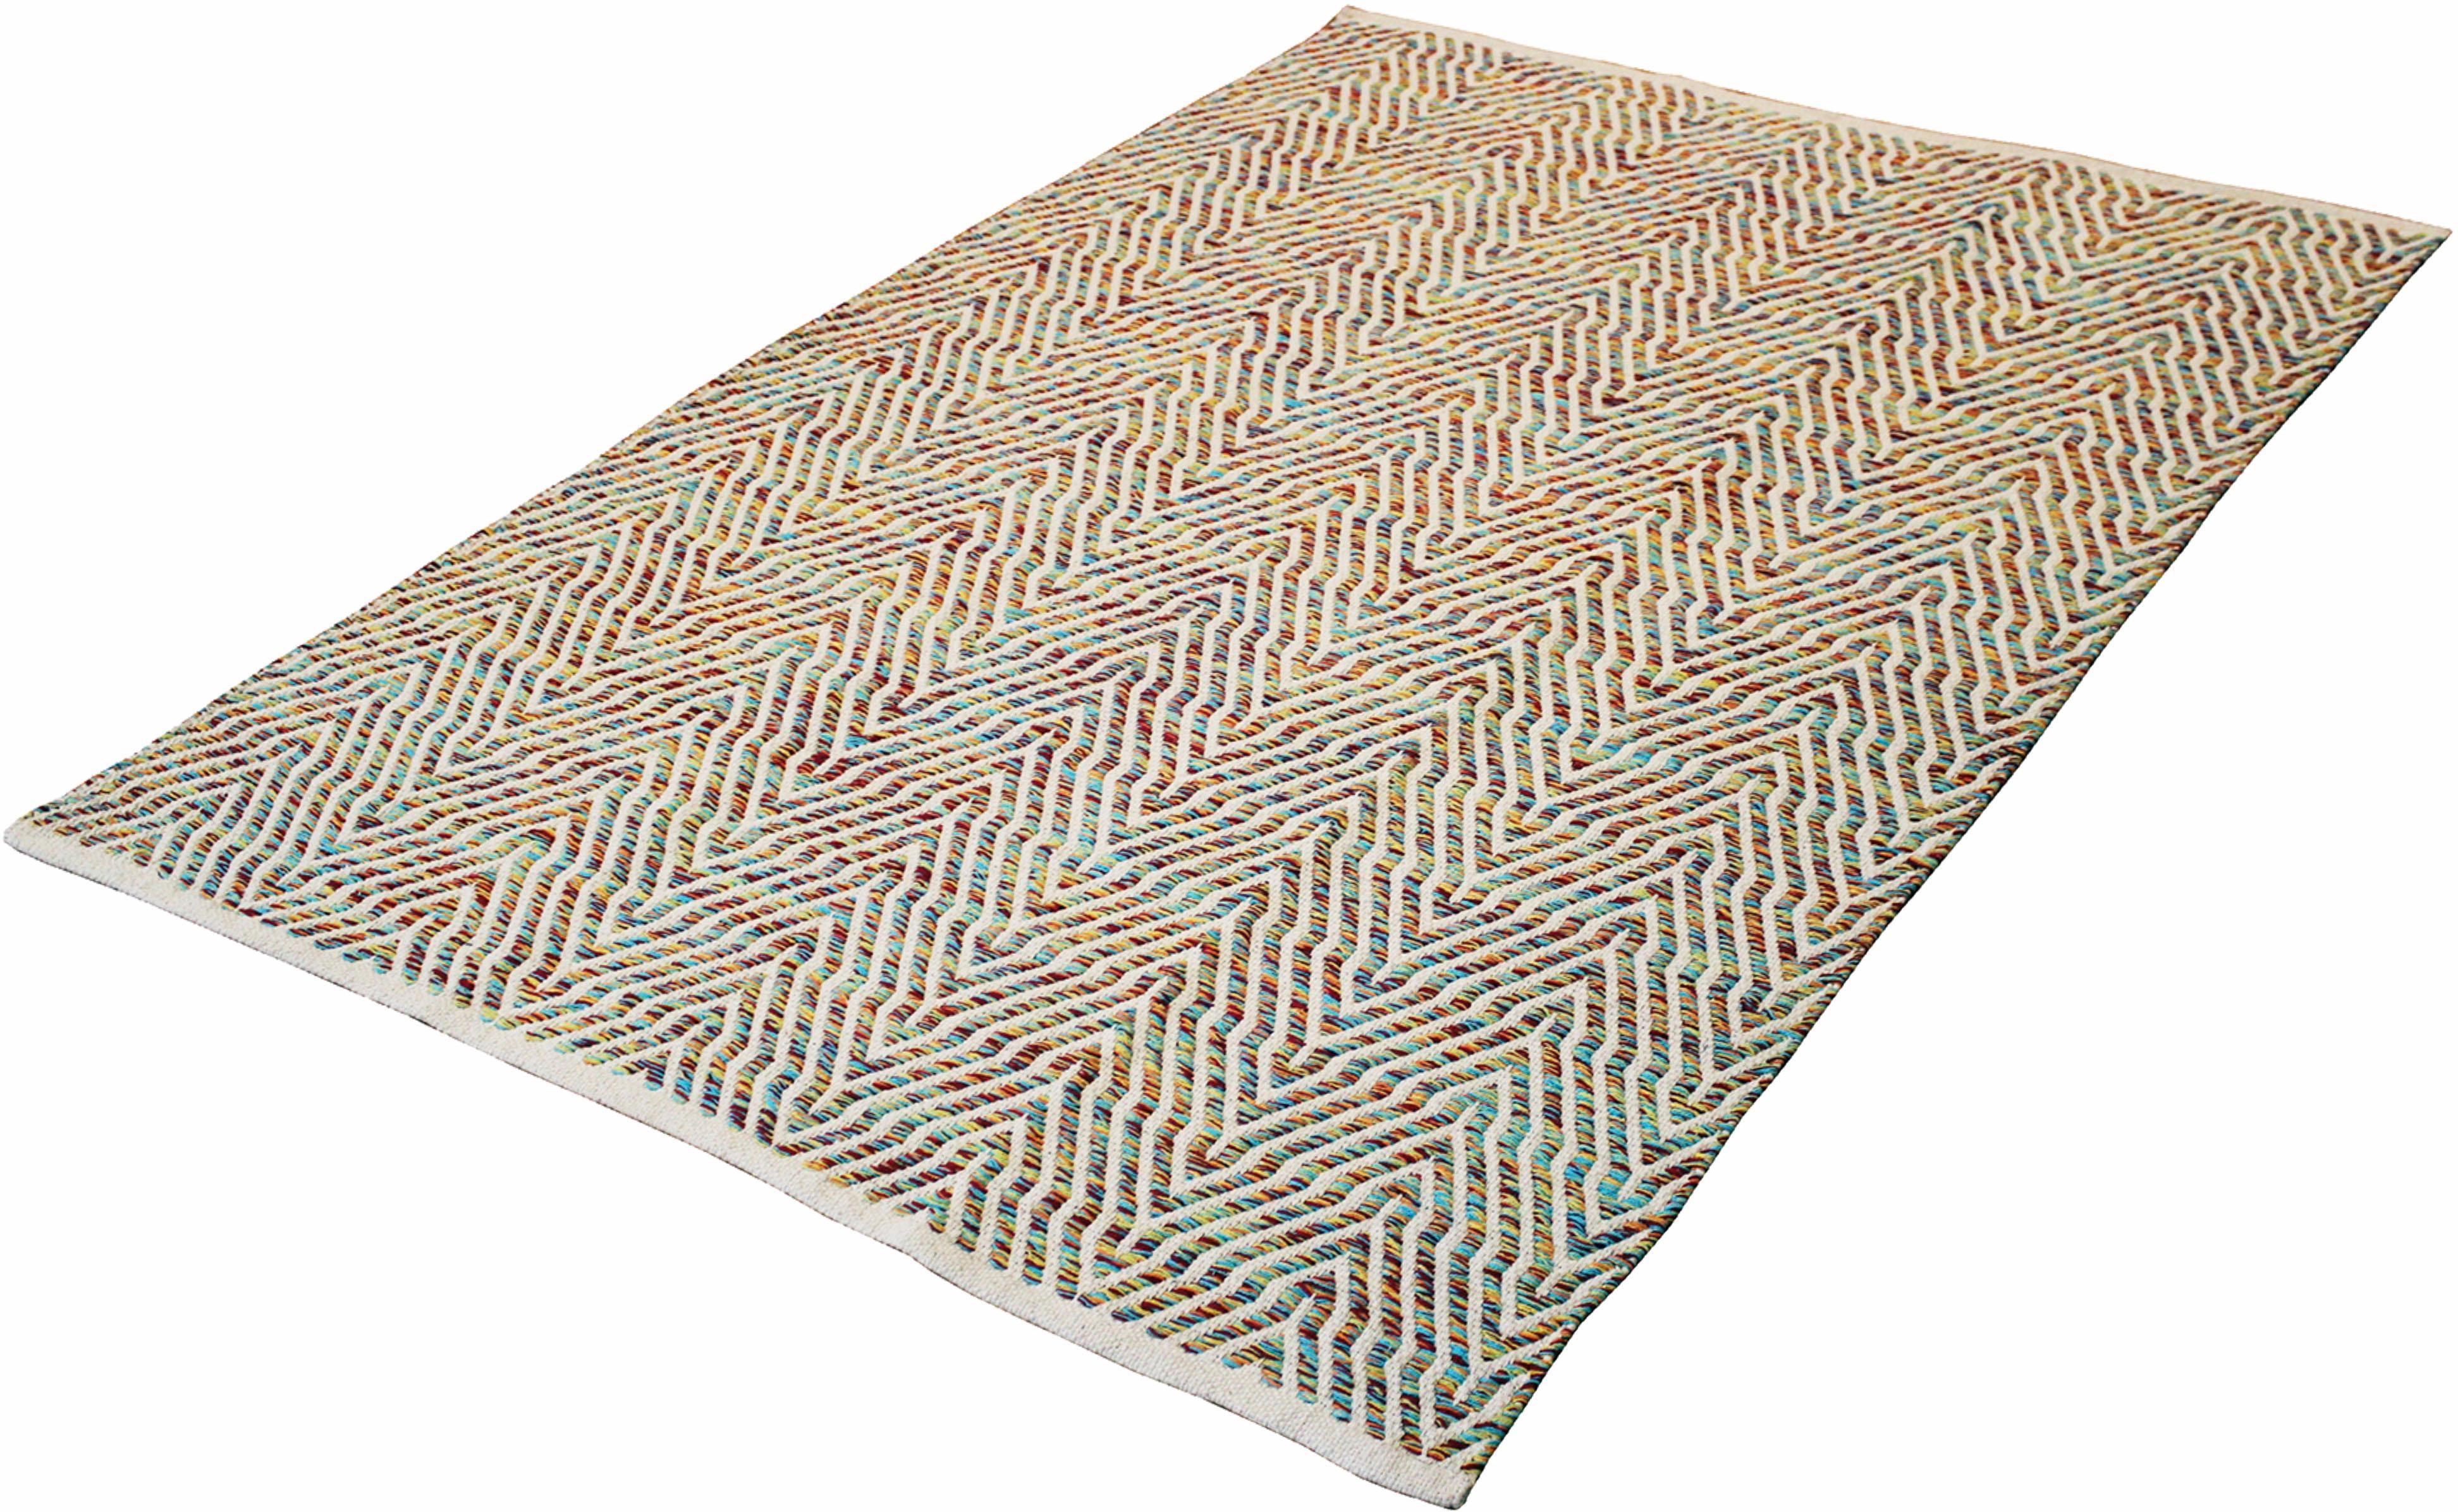 Teppich Aperitif 410 Kayoom rechteckig Höhe 7 mm handgewebt